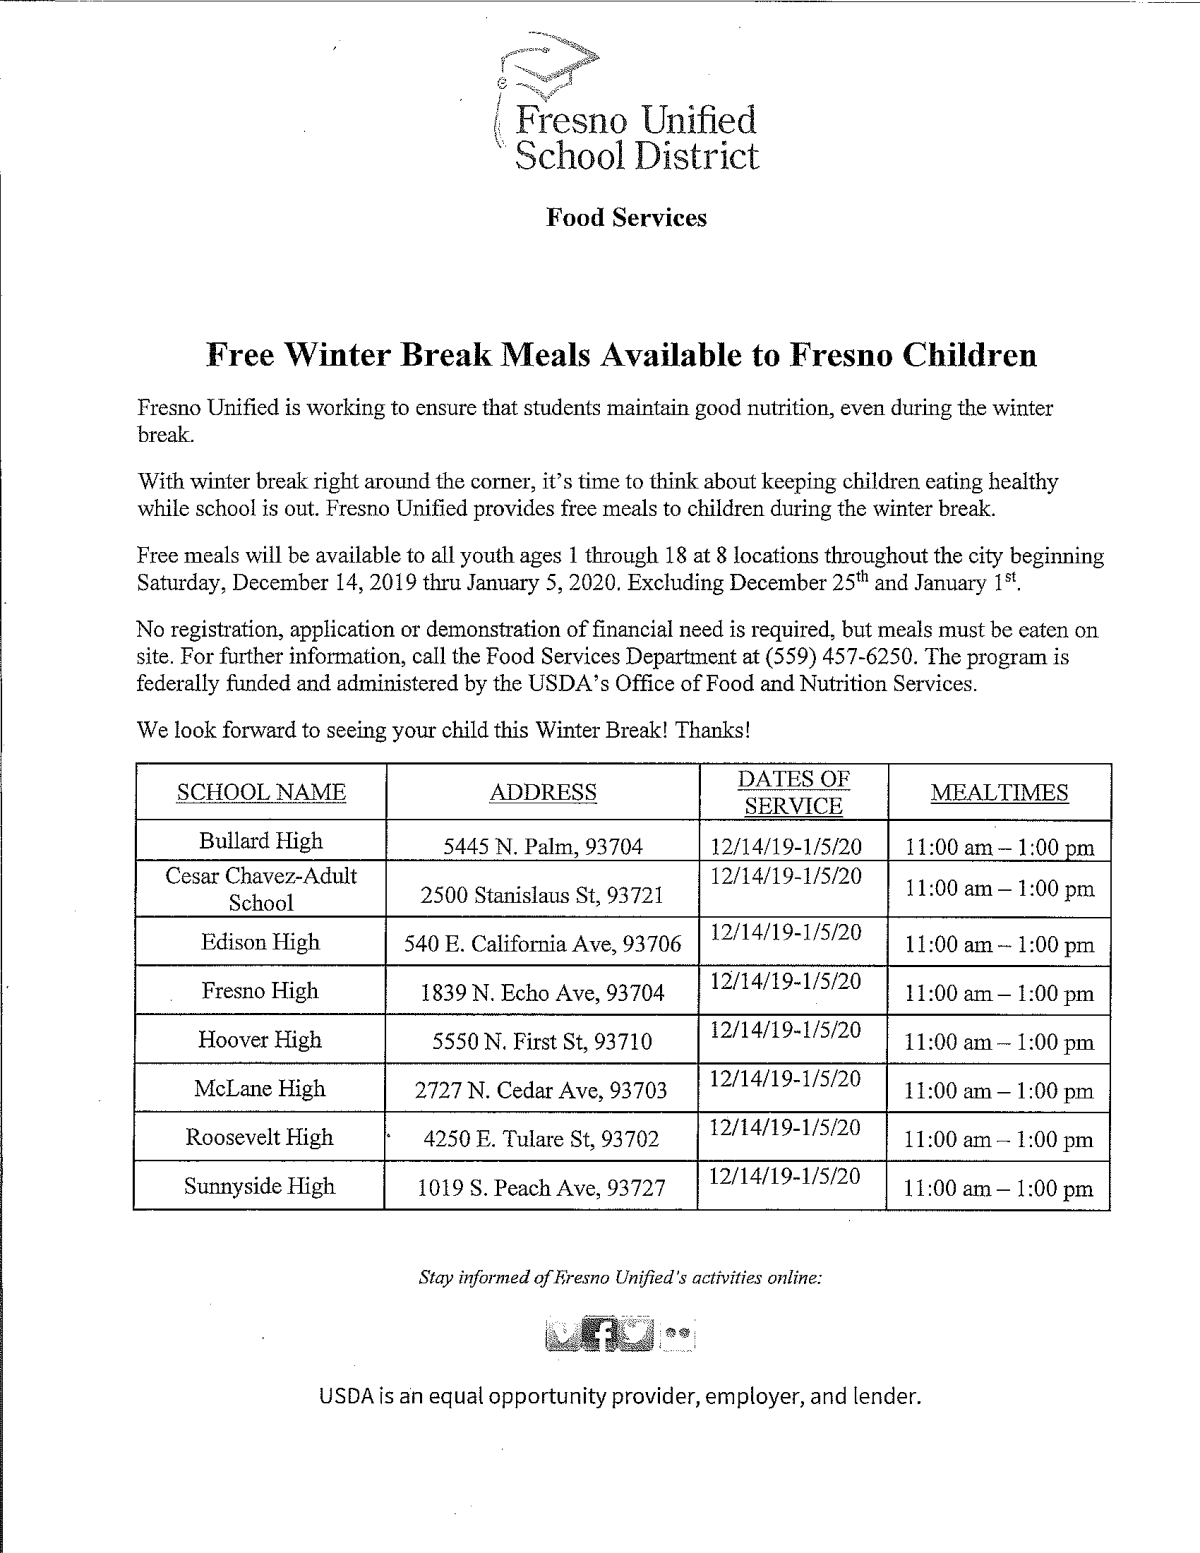 Fresno Unified Christmas Break 2020 Free Meals During Winter Break